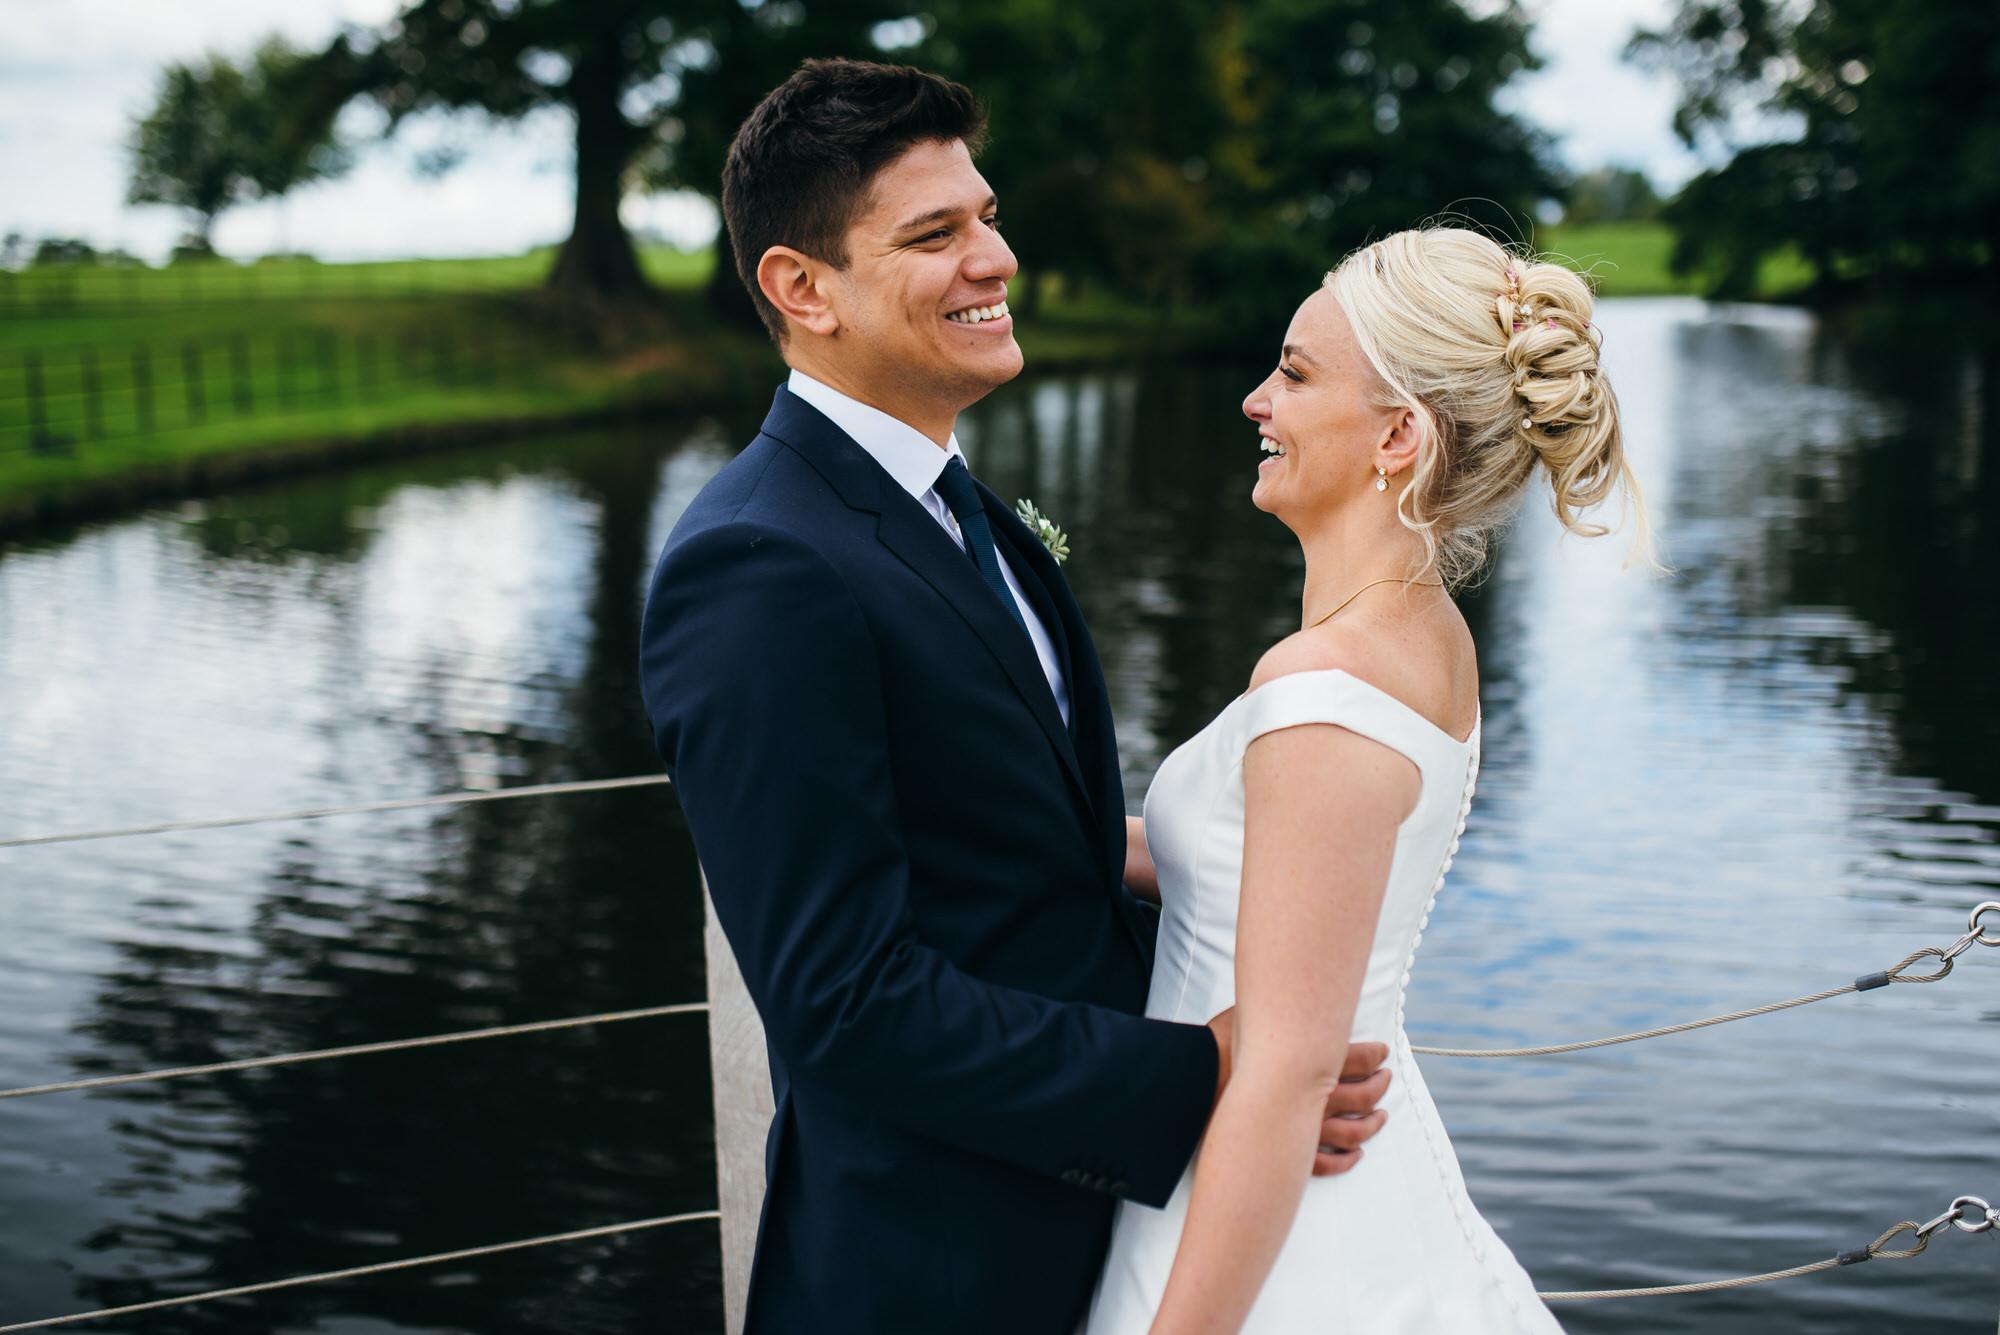 Merrydale manor wedding photography 069